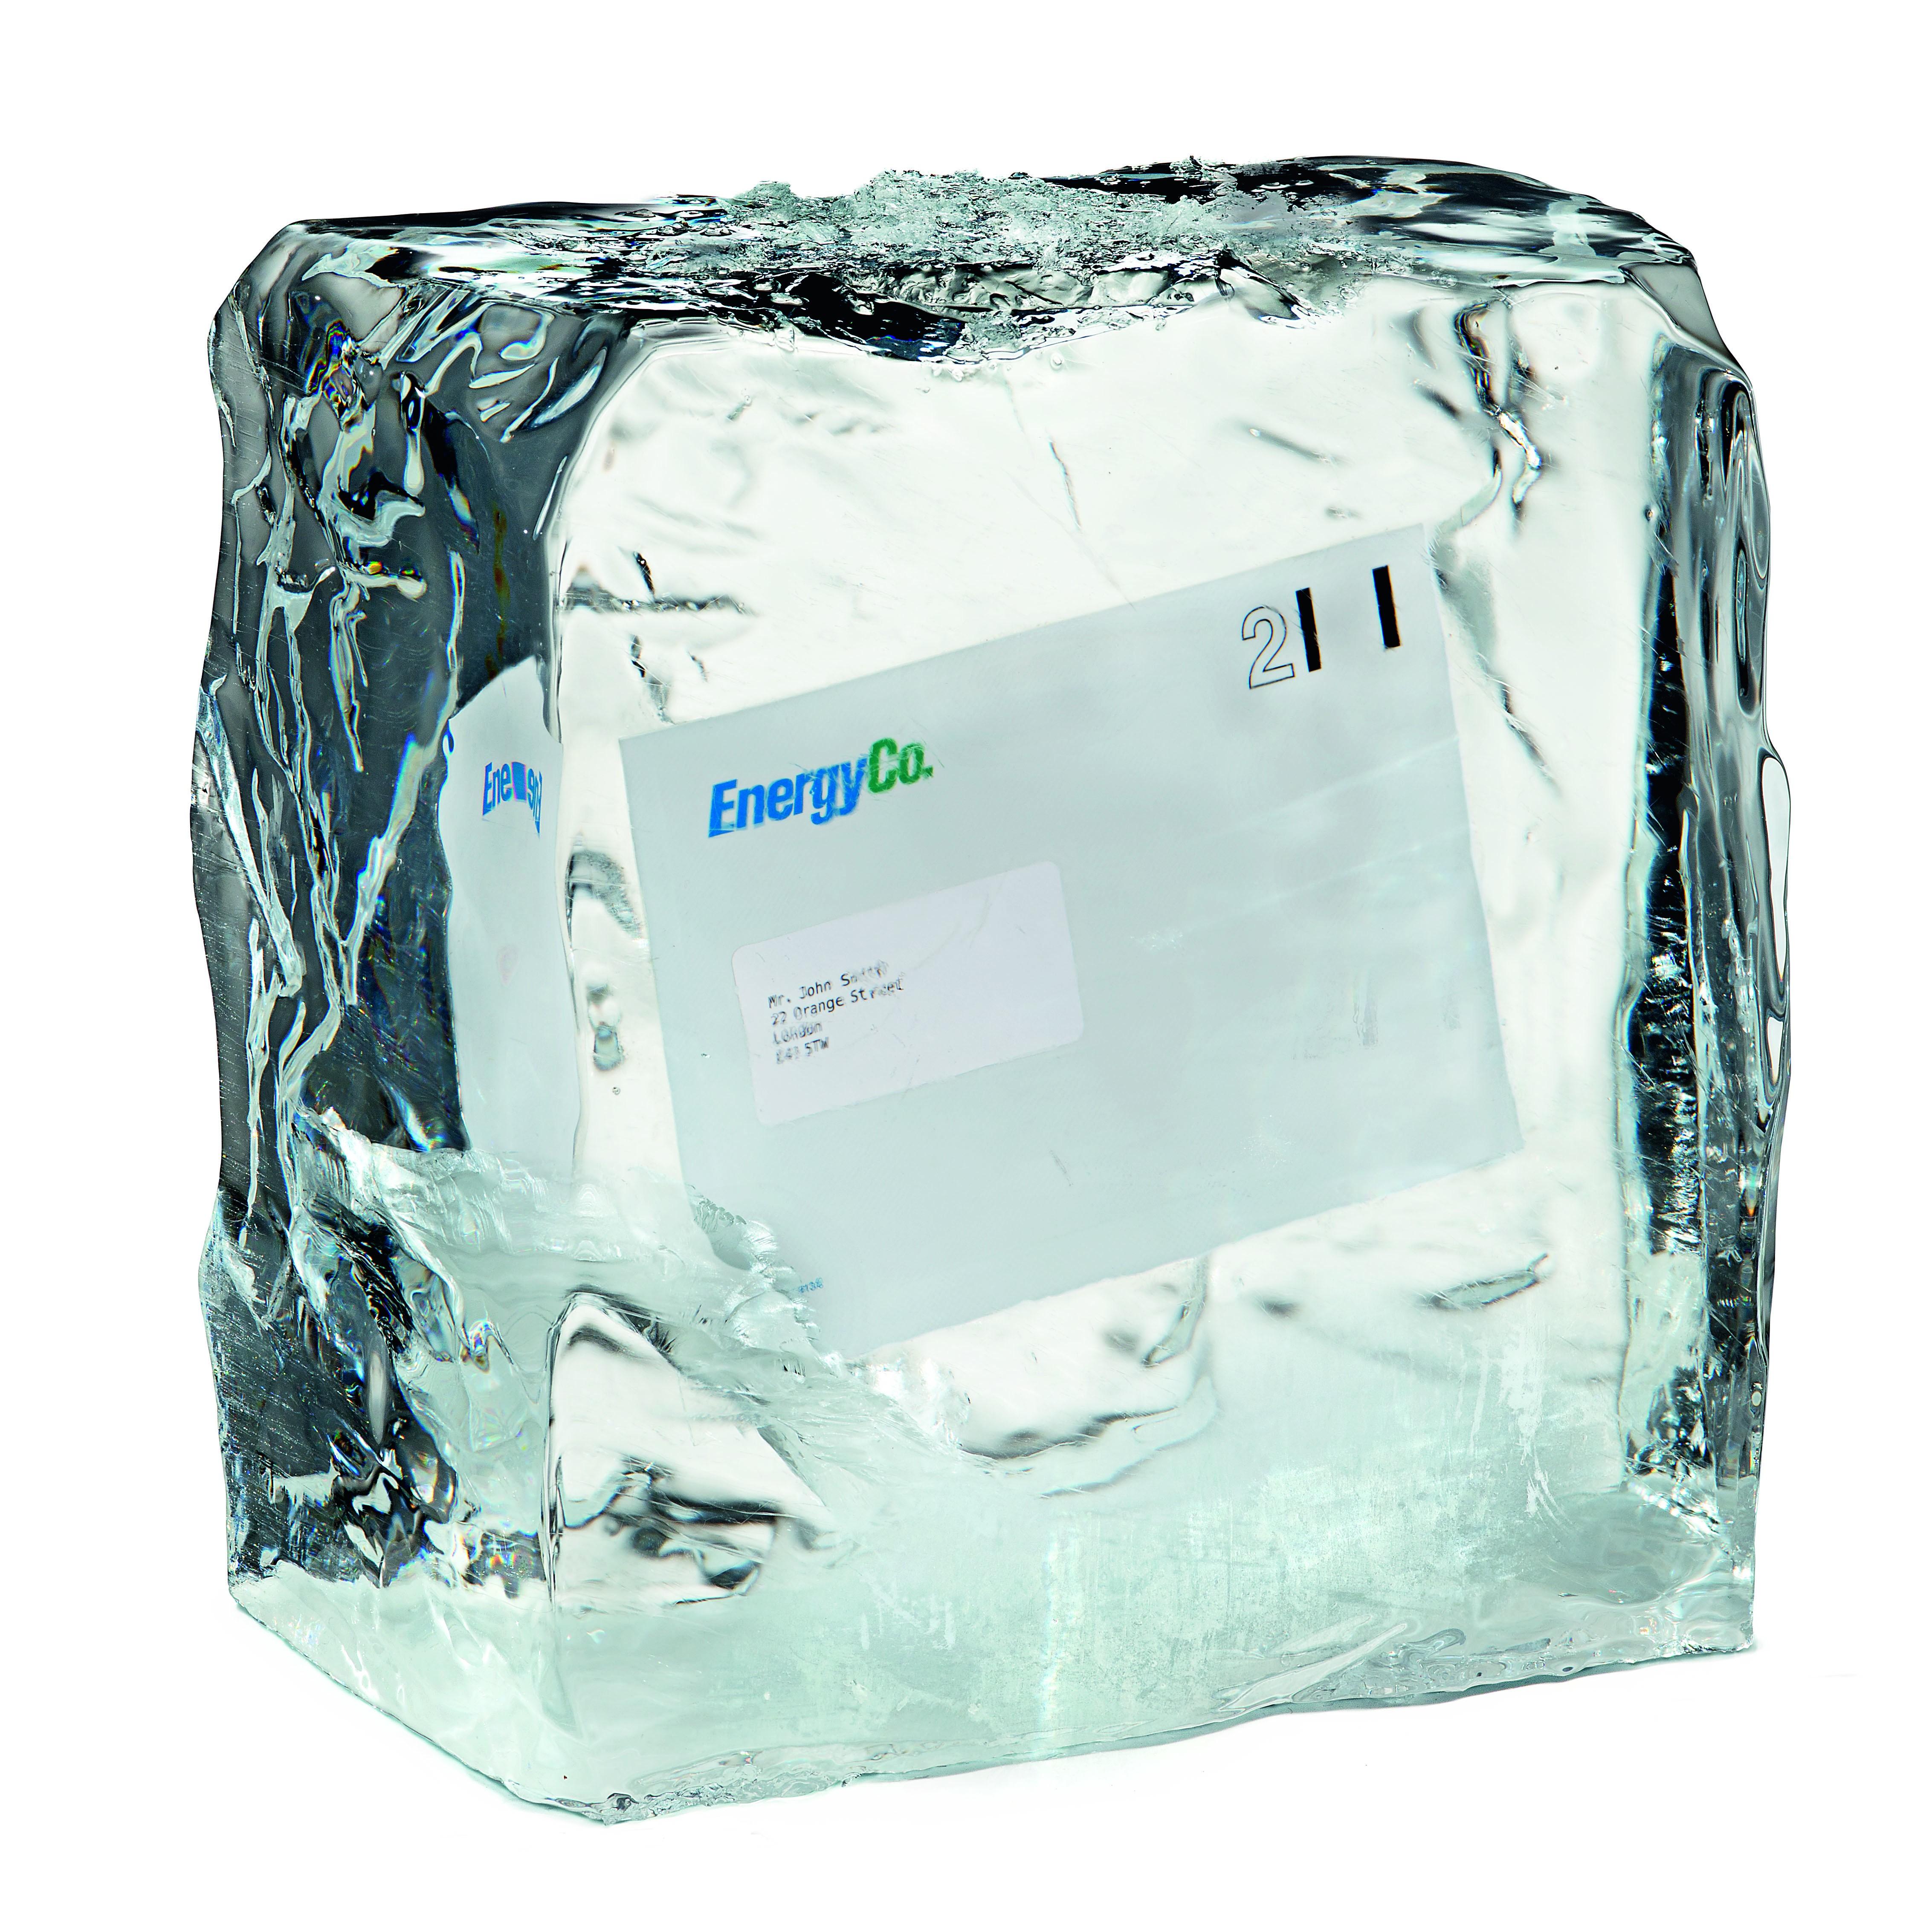 ice-cube-image